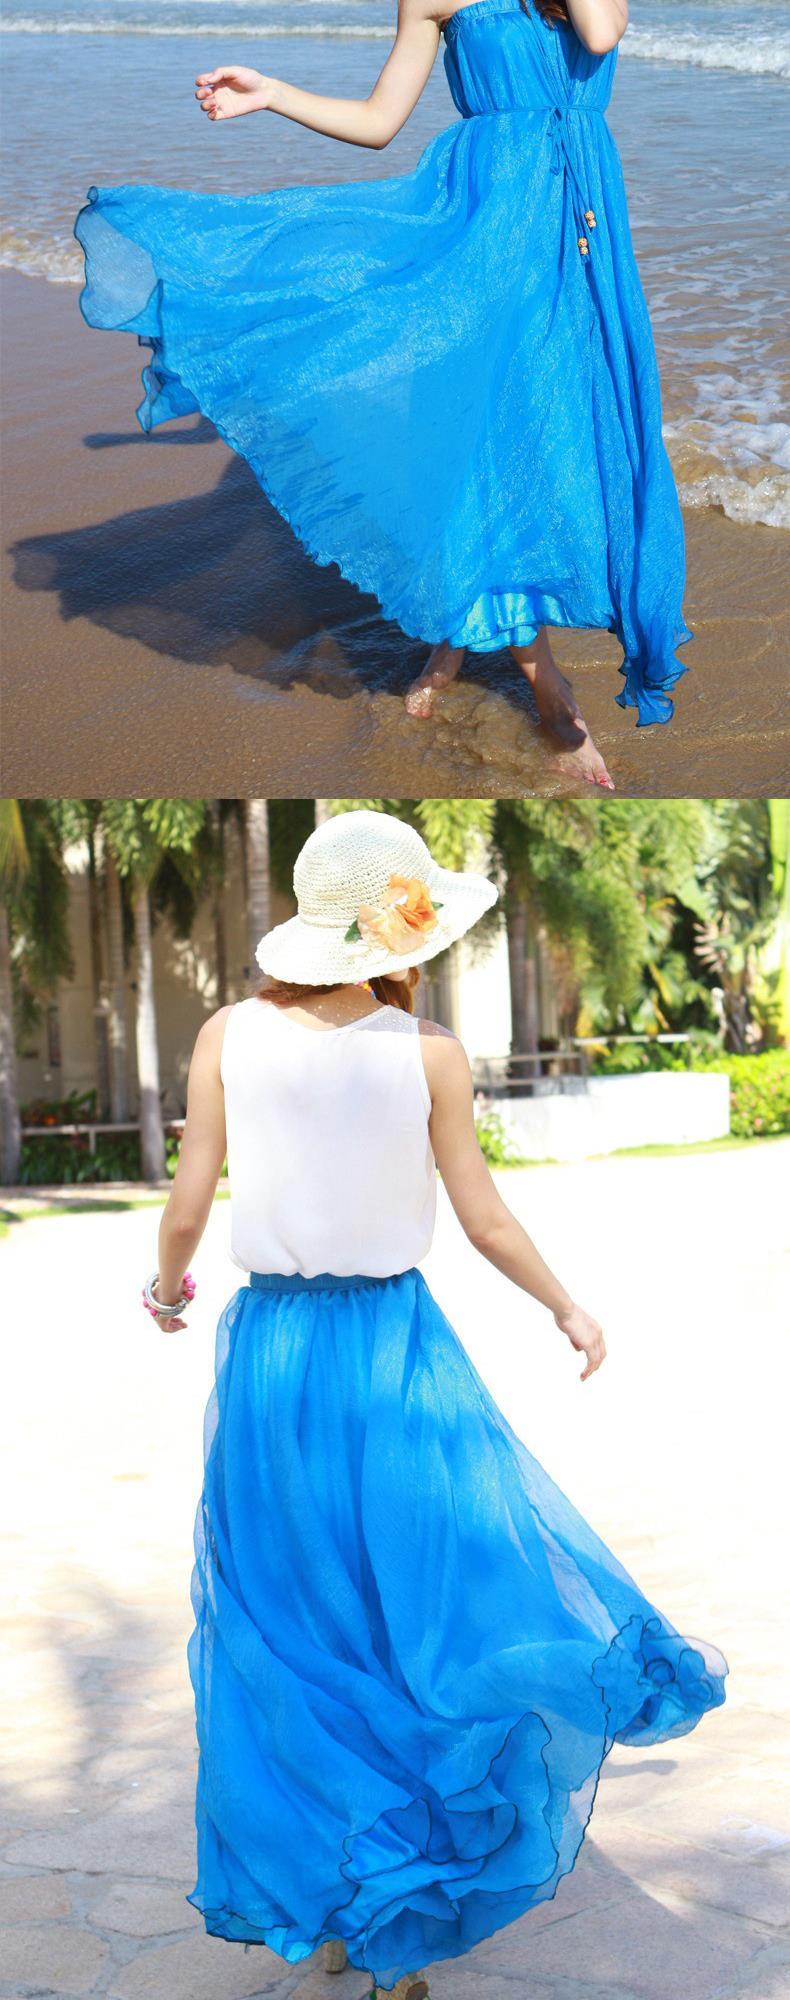 Sherhure 19 High Waist Women Chiffon Long Skirts Floor Length Ruffles White Summer Boho Maxi Skirt Saia Longa Faldas 25